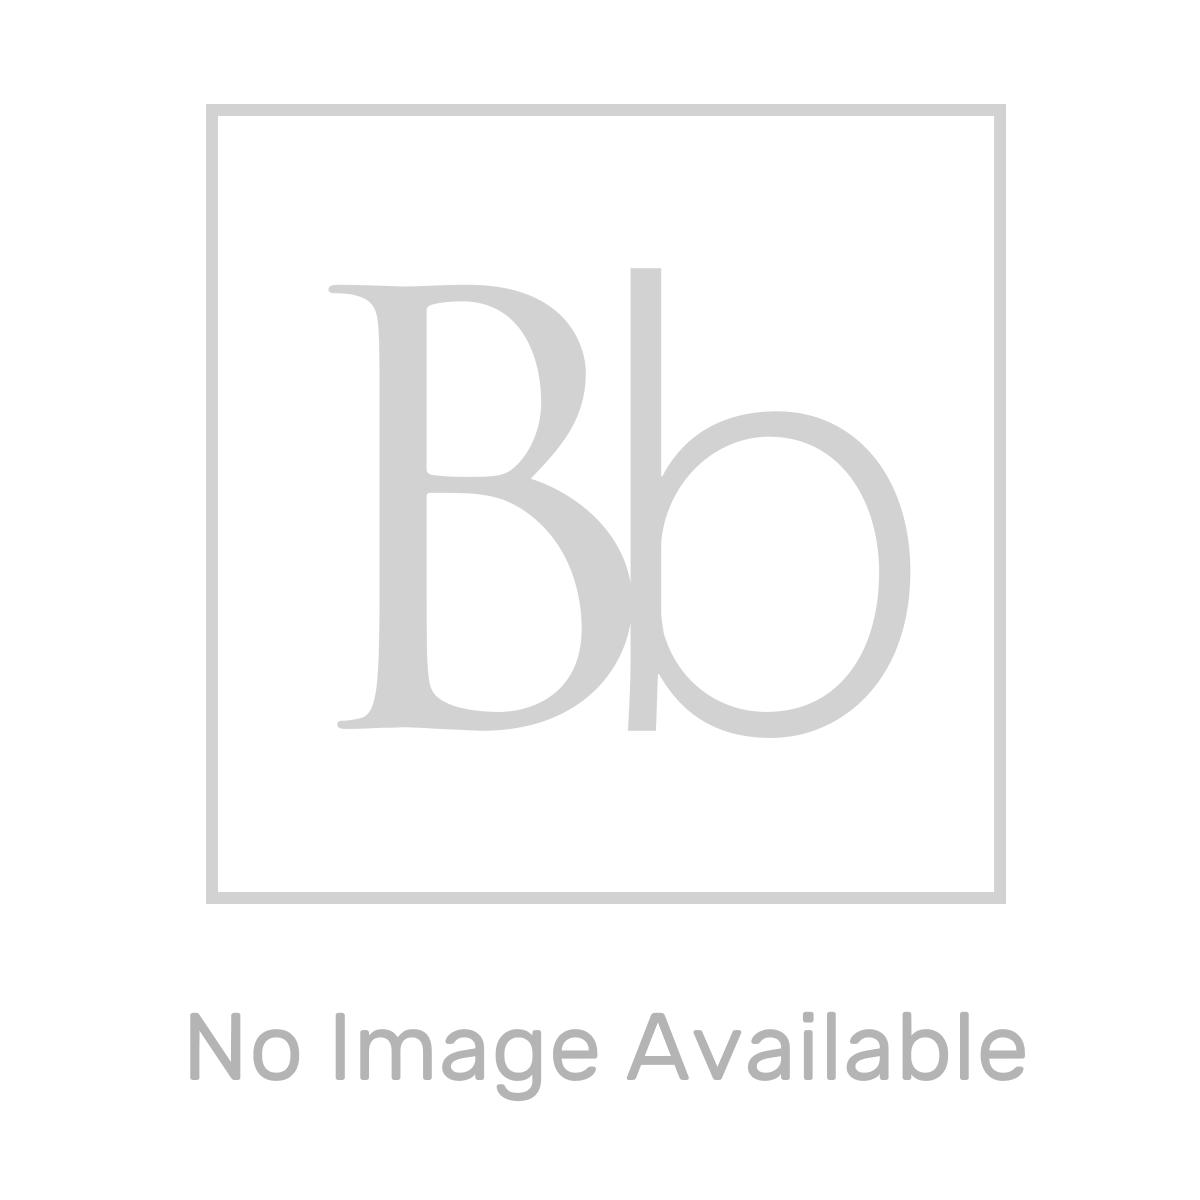 RAK Cubis Black Wall Mounted Robe Hook Measurements